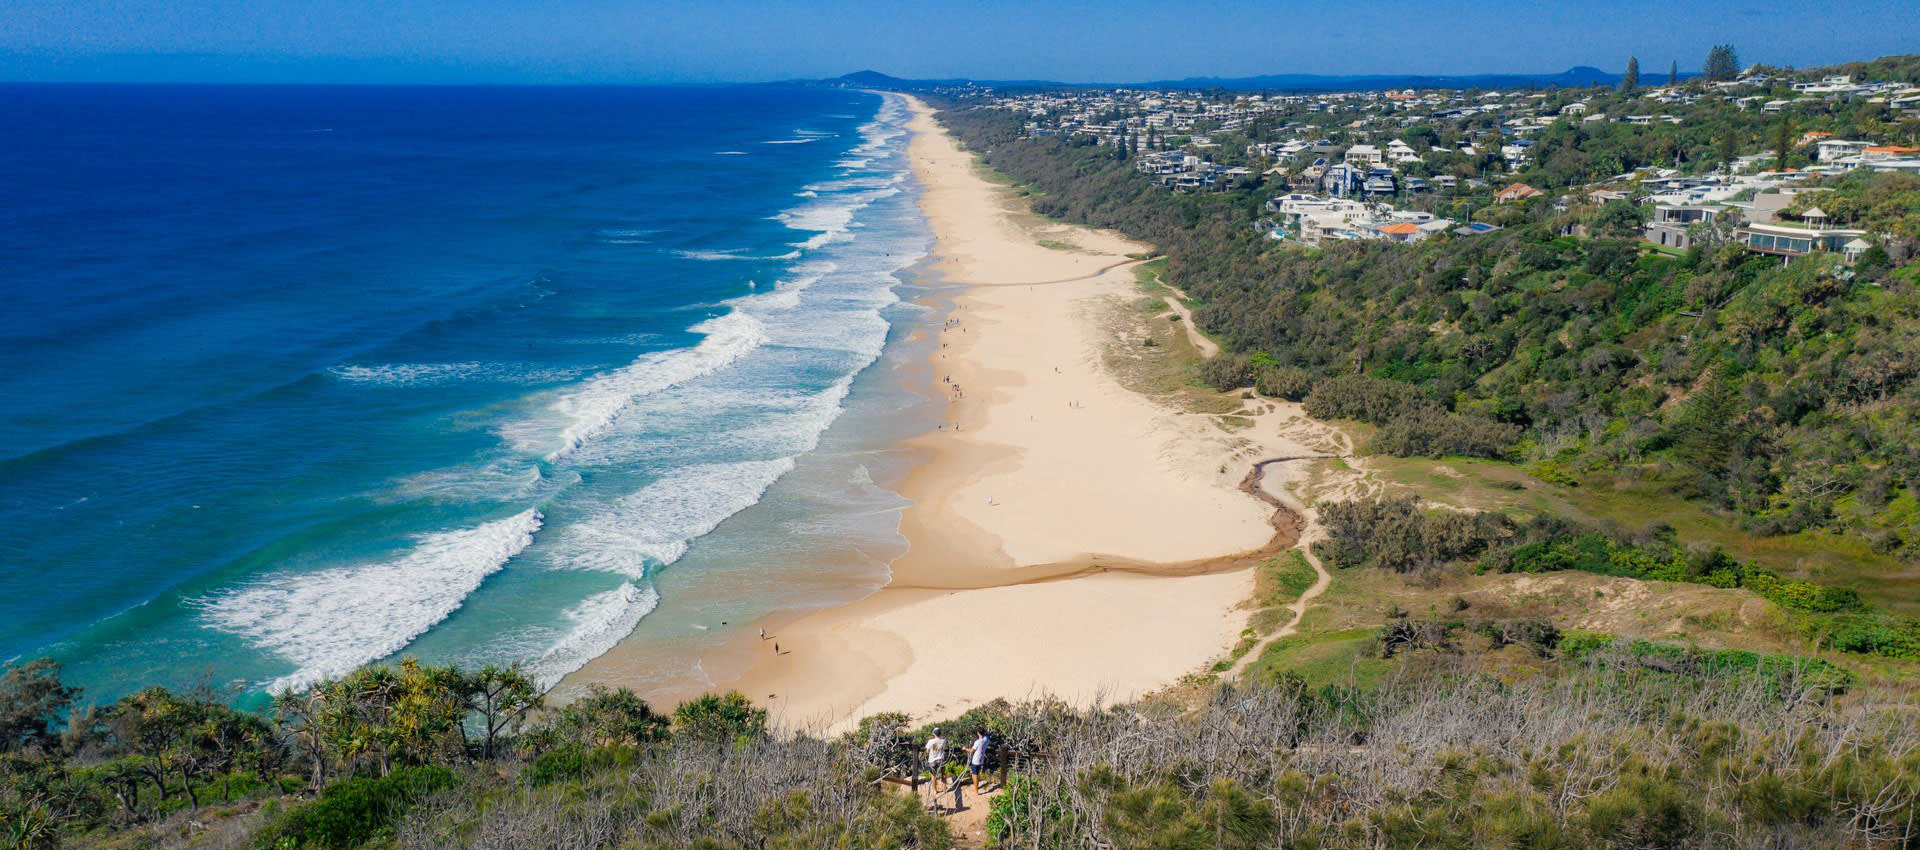 7 Sunshine Coast beaches in 7 sunshine-filled days